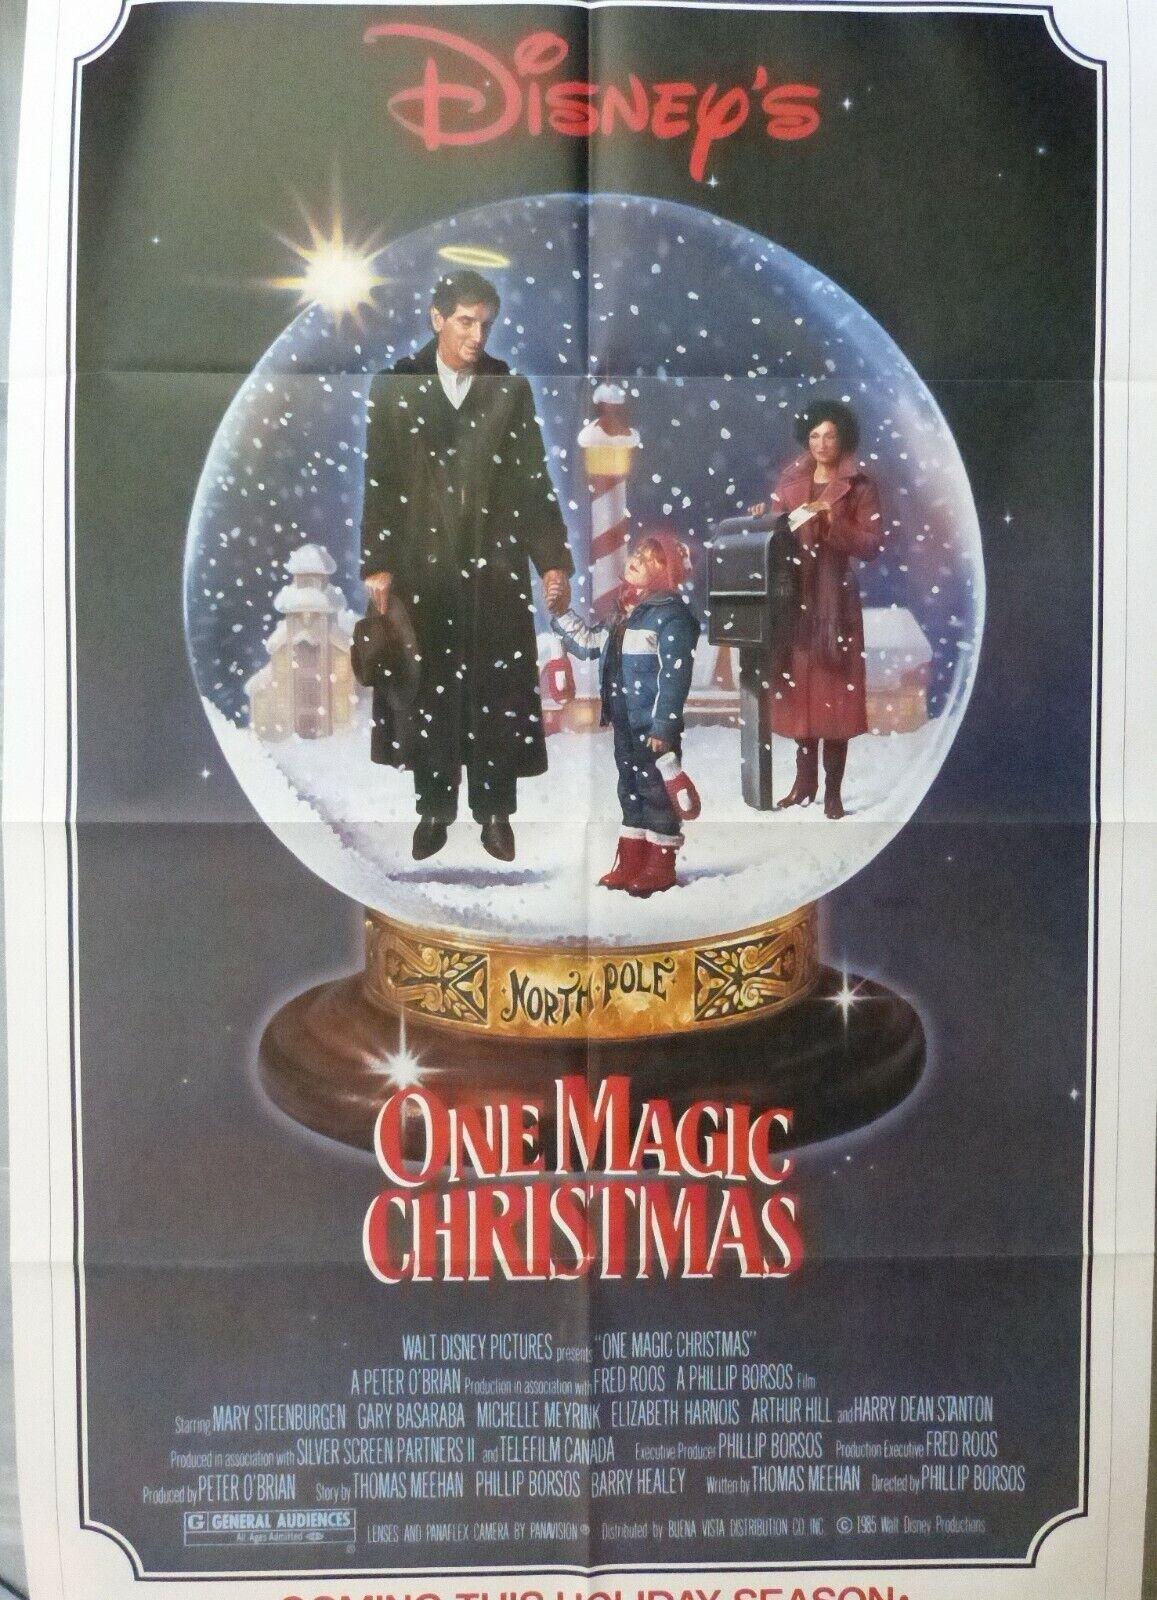 One Magic Christmas Movie Poster,1985,1-Sheet,Original,Arthur Hill